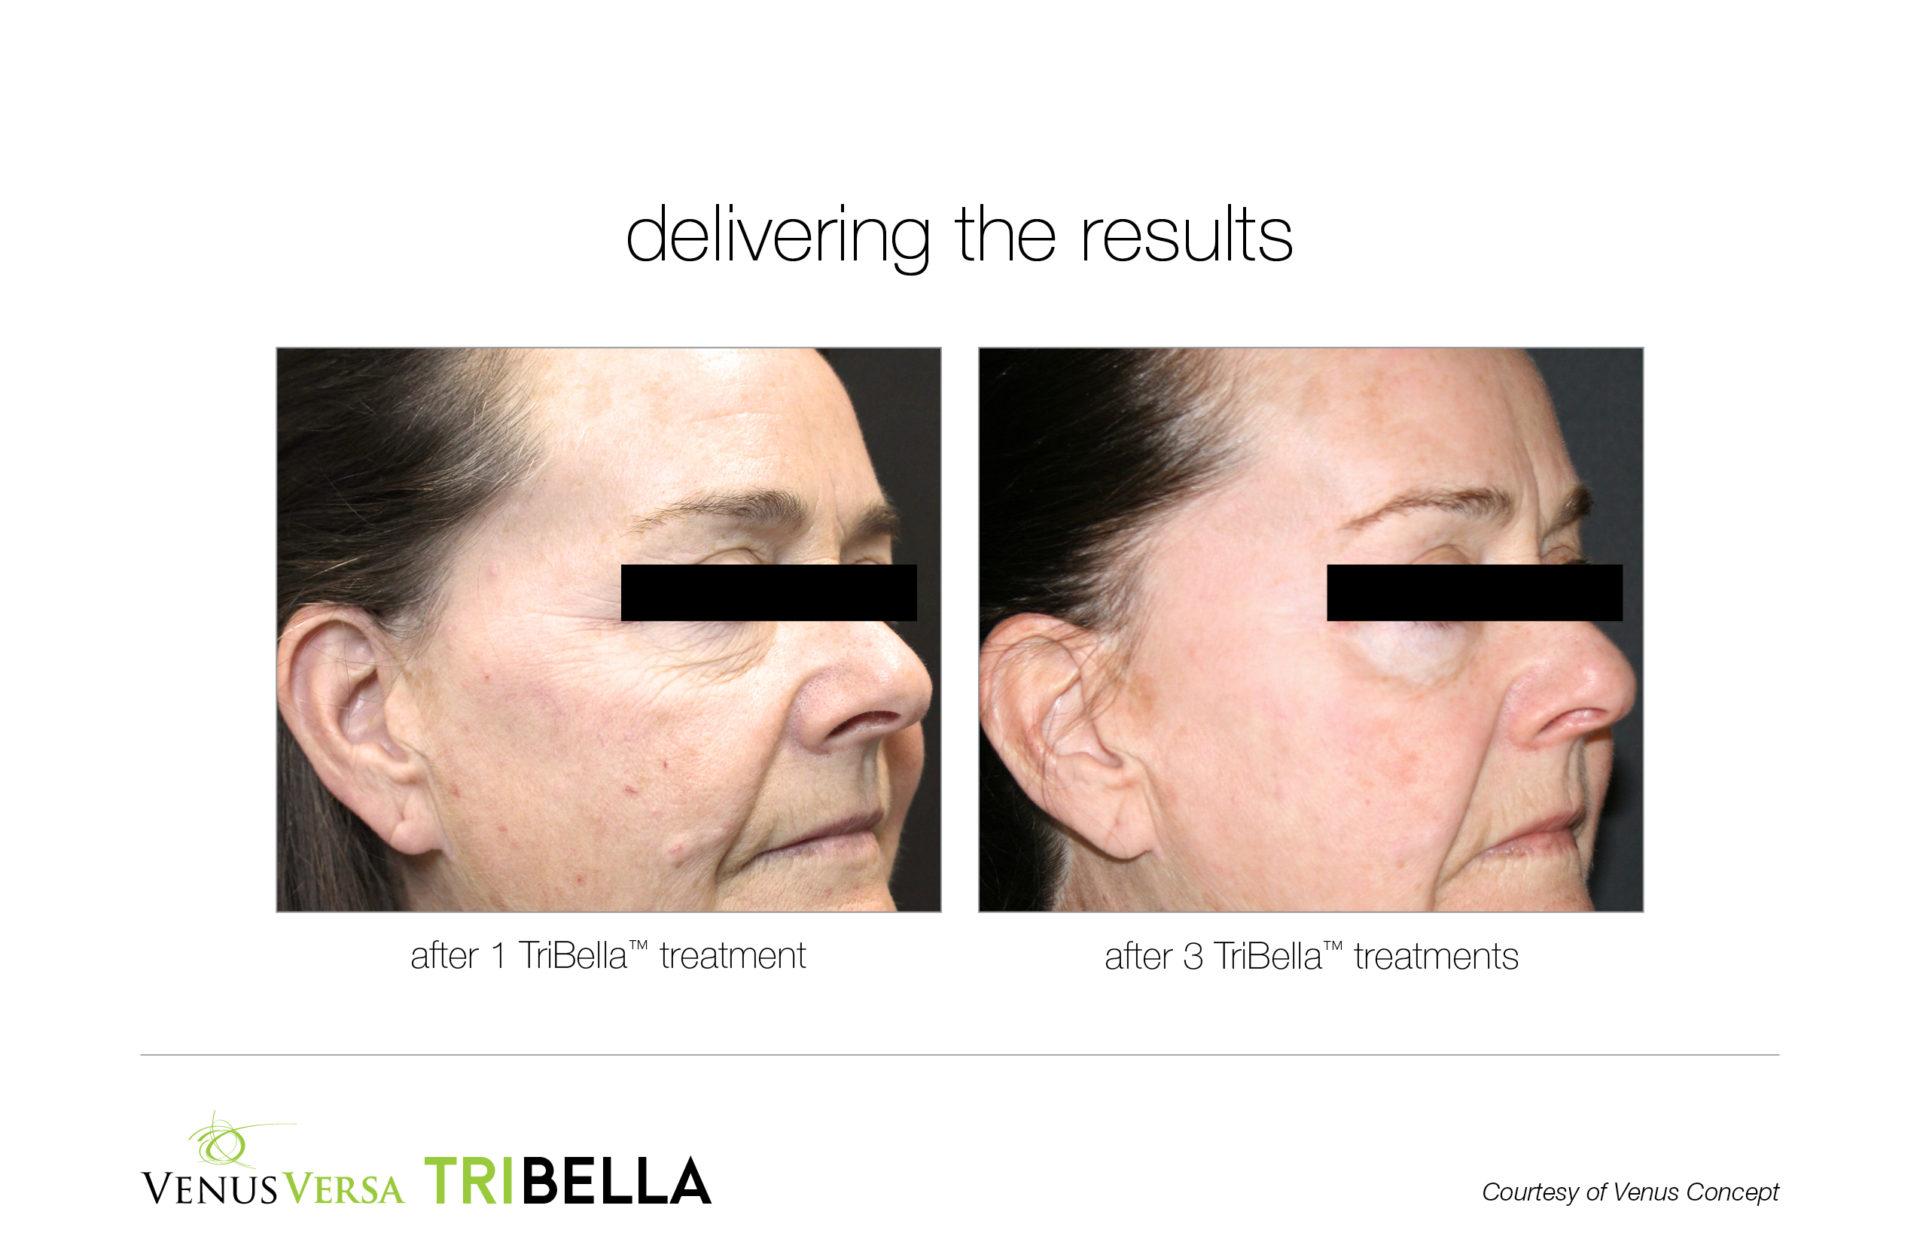 Venus Versa TriBella Facial Treatments, Anti-Ageing at Top Skin Clinic in Bishop's Stortford, Hertfordshire